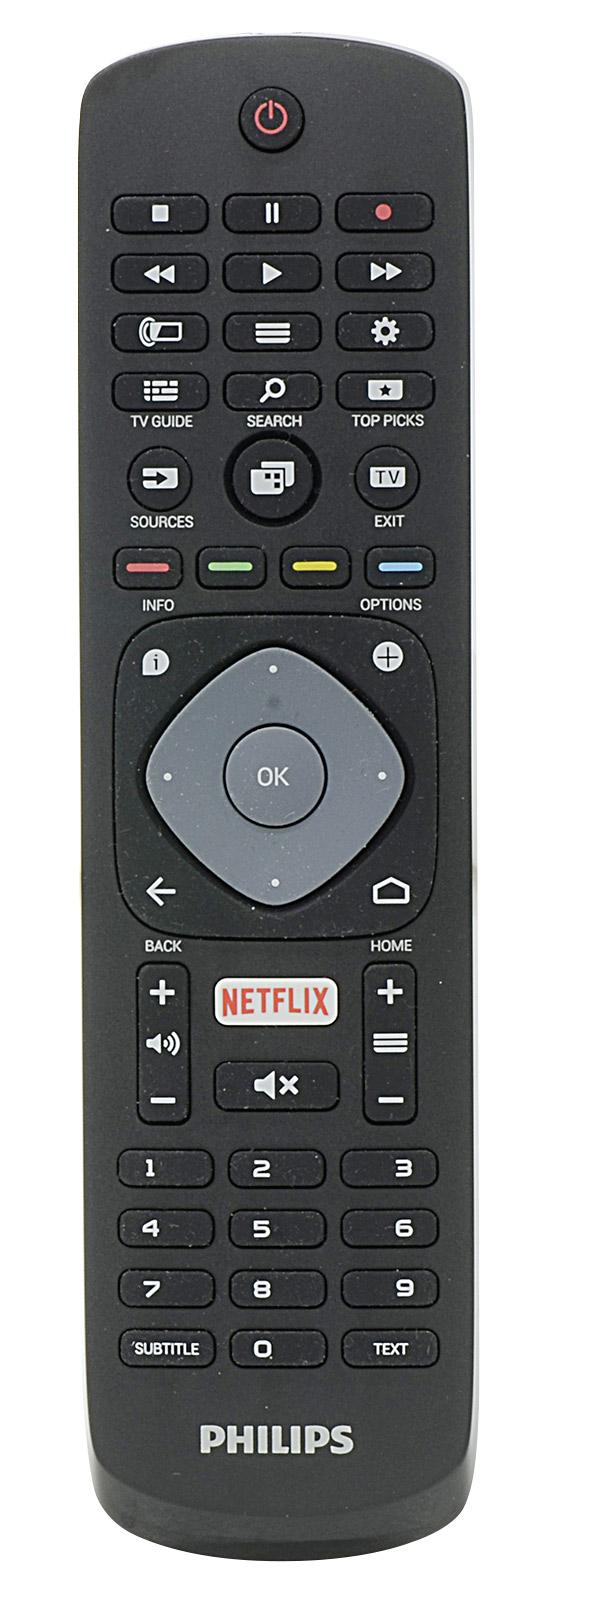 Philips 49put6401 digital video ht for Philips telecomando